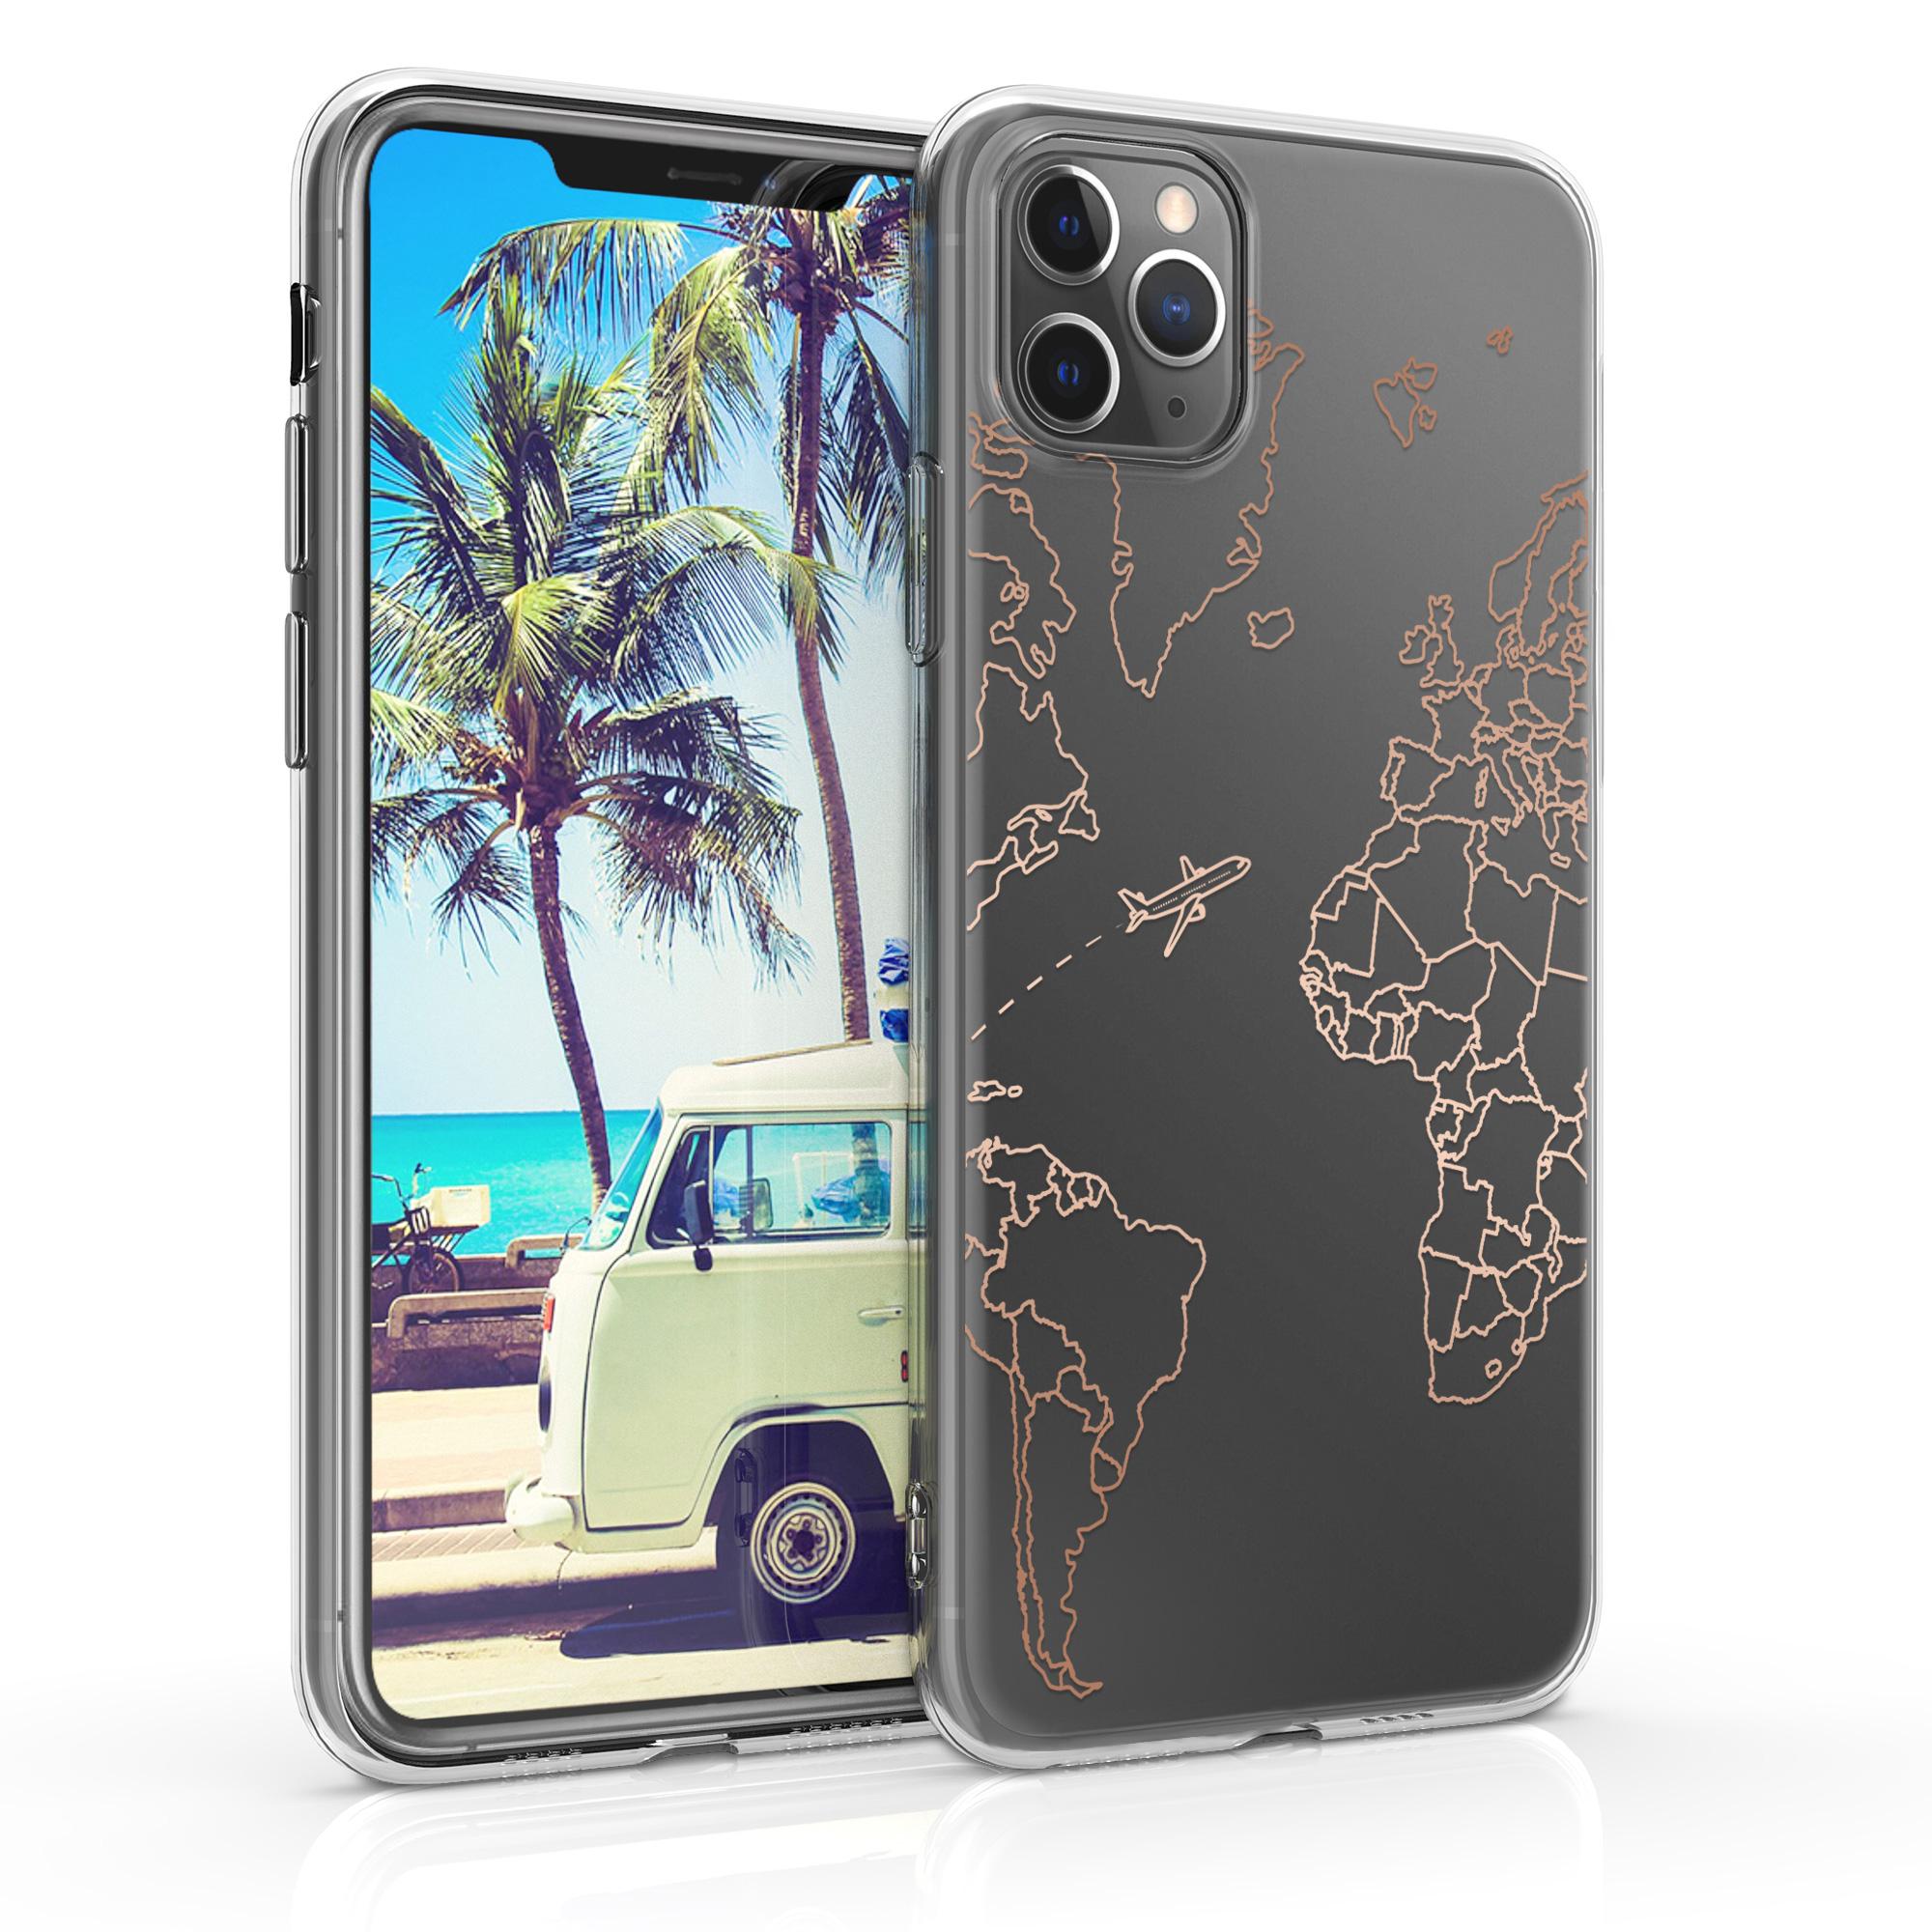 Kvalitní silikonové TPU pouzdro pro Apple iPhone 11 Pro Max - Travel & Prozkoumat Rose Gold | Transparent